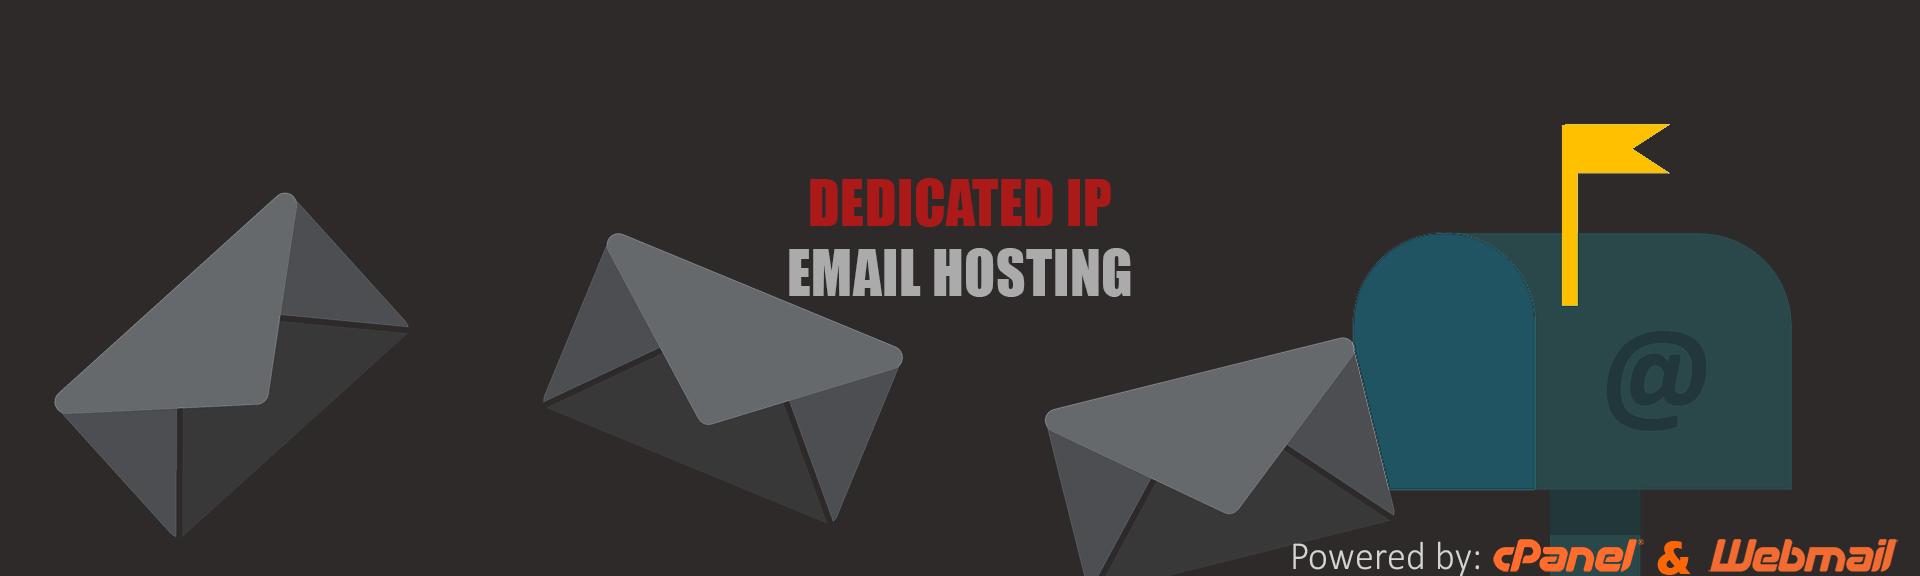 dedicated ip email hosting bdwebtech bangladesh